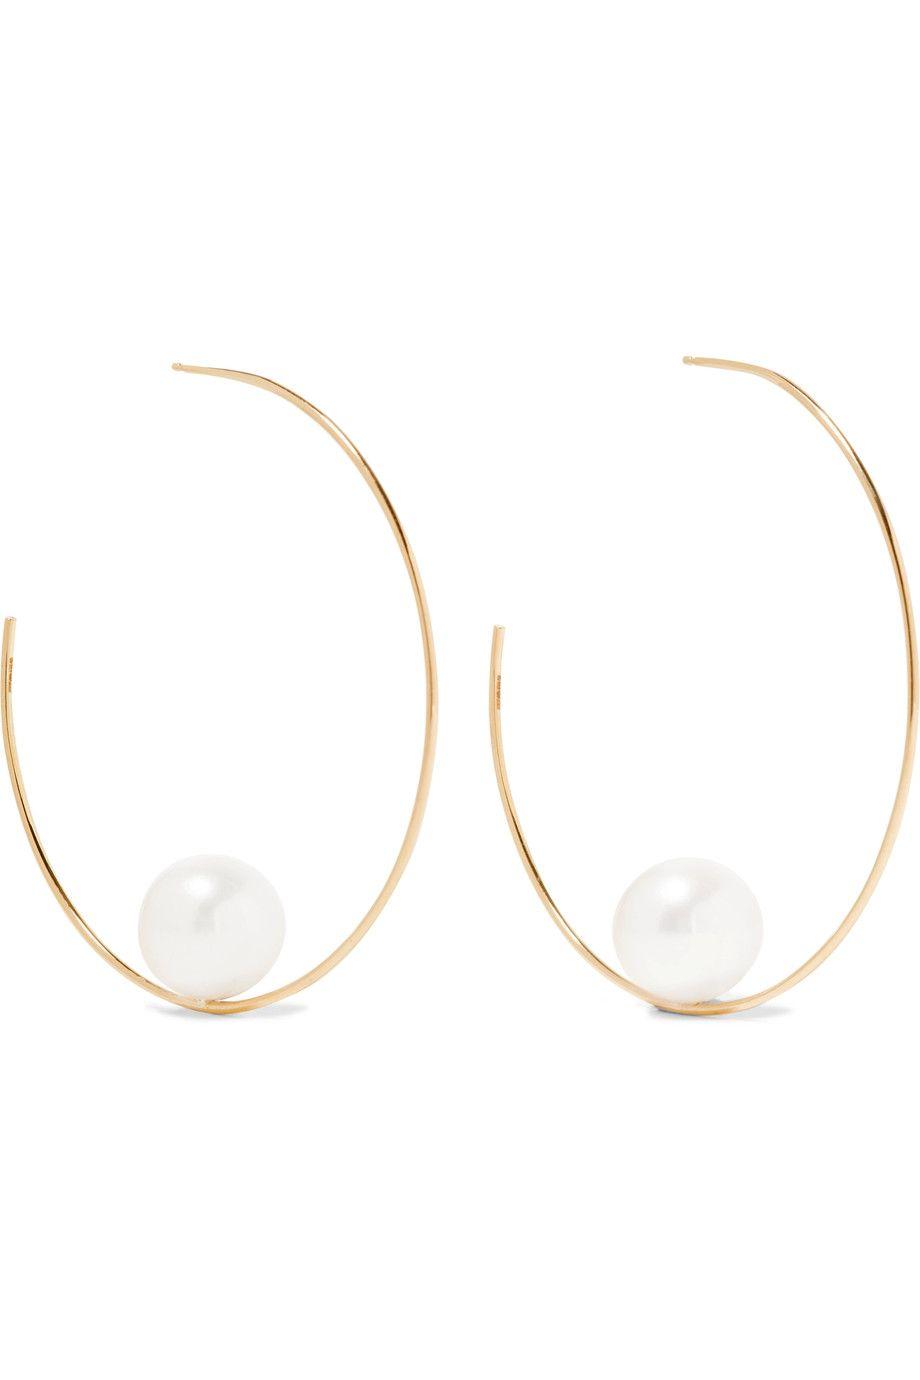 "<p>Mizuki, 14 Karat Gold Pearl earring, $1,990;<a href=""https://www.net-a-porter.com/us/en/product/800962/mizuki/14-karat-gold-pearl-earrings"">net-a-porter.com</a></p>"